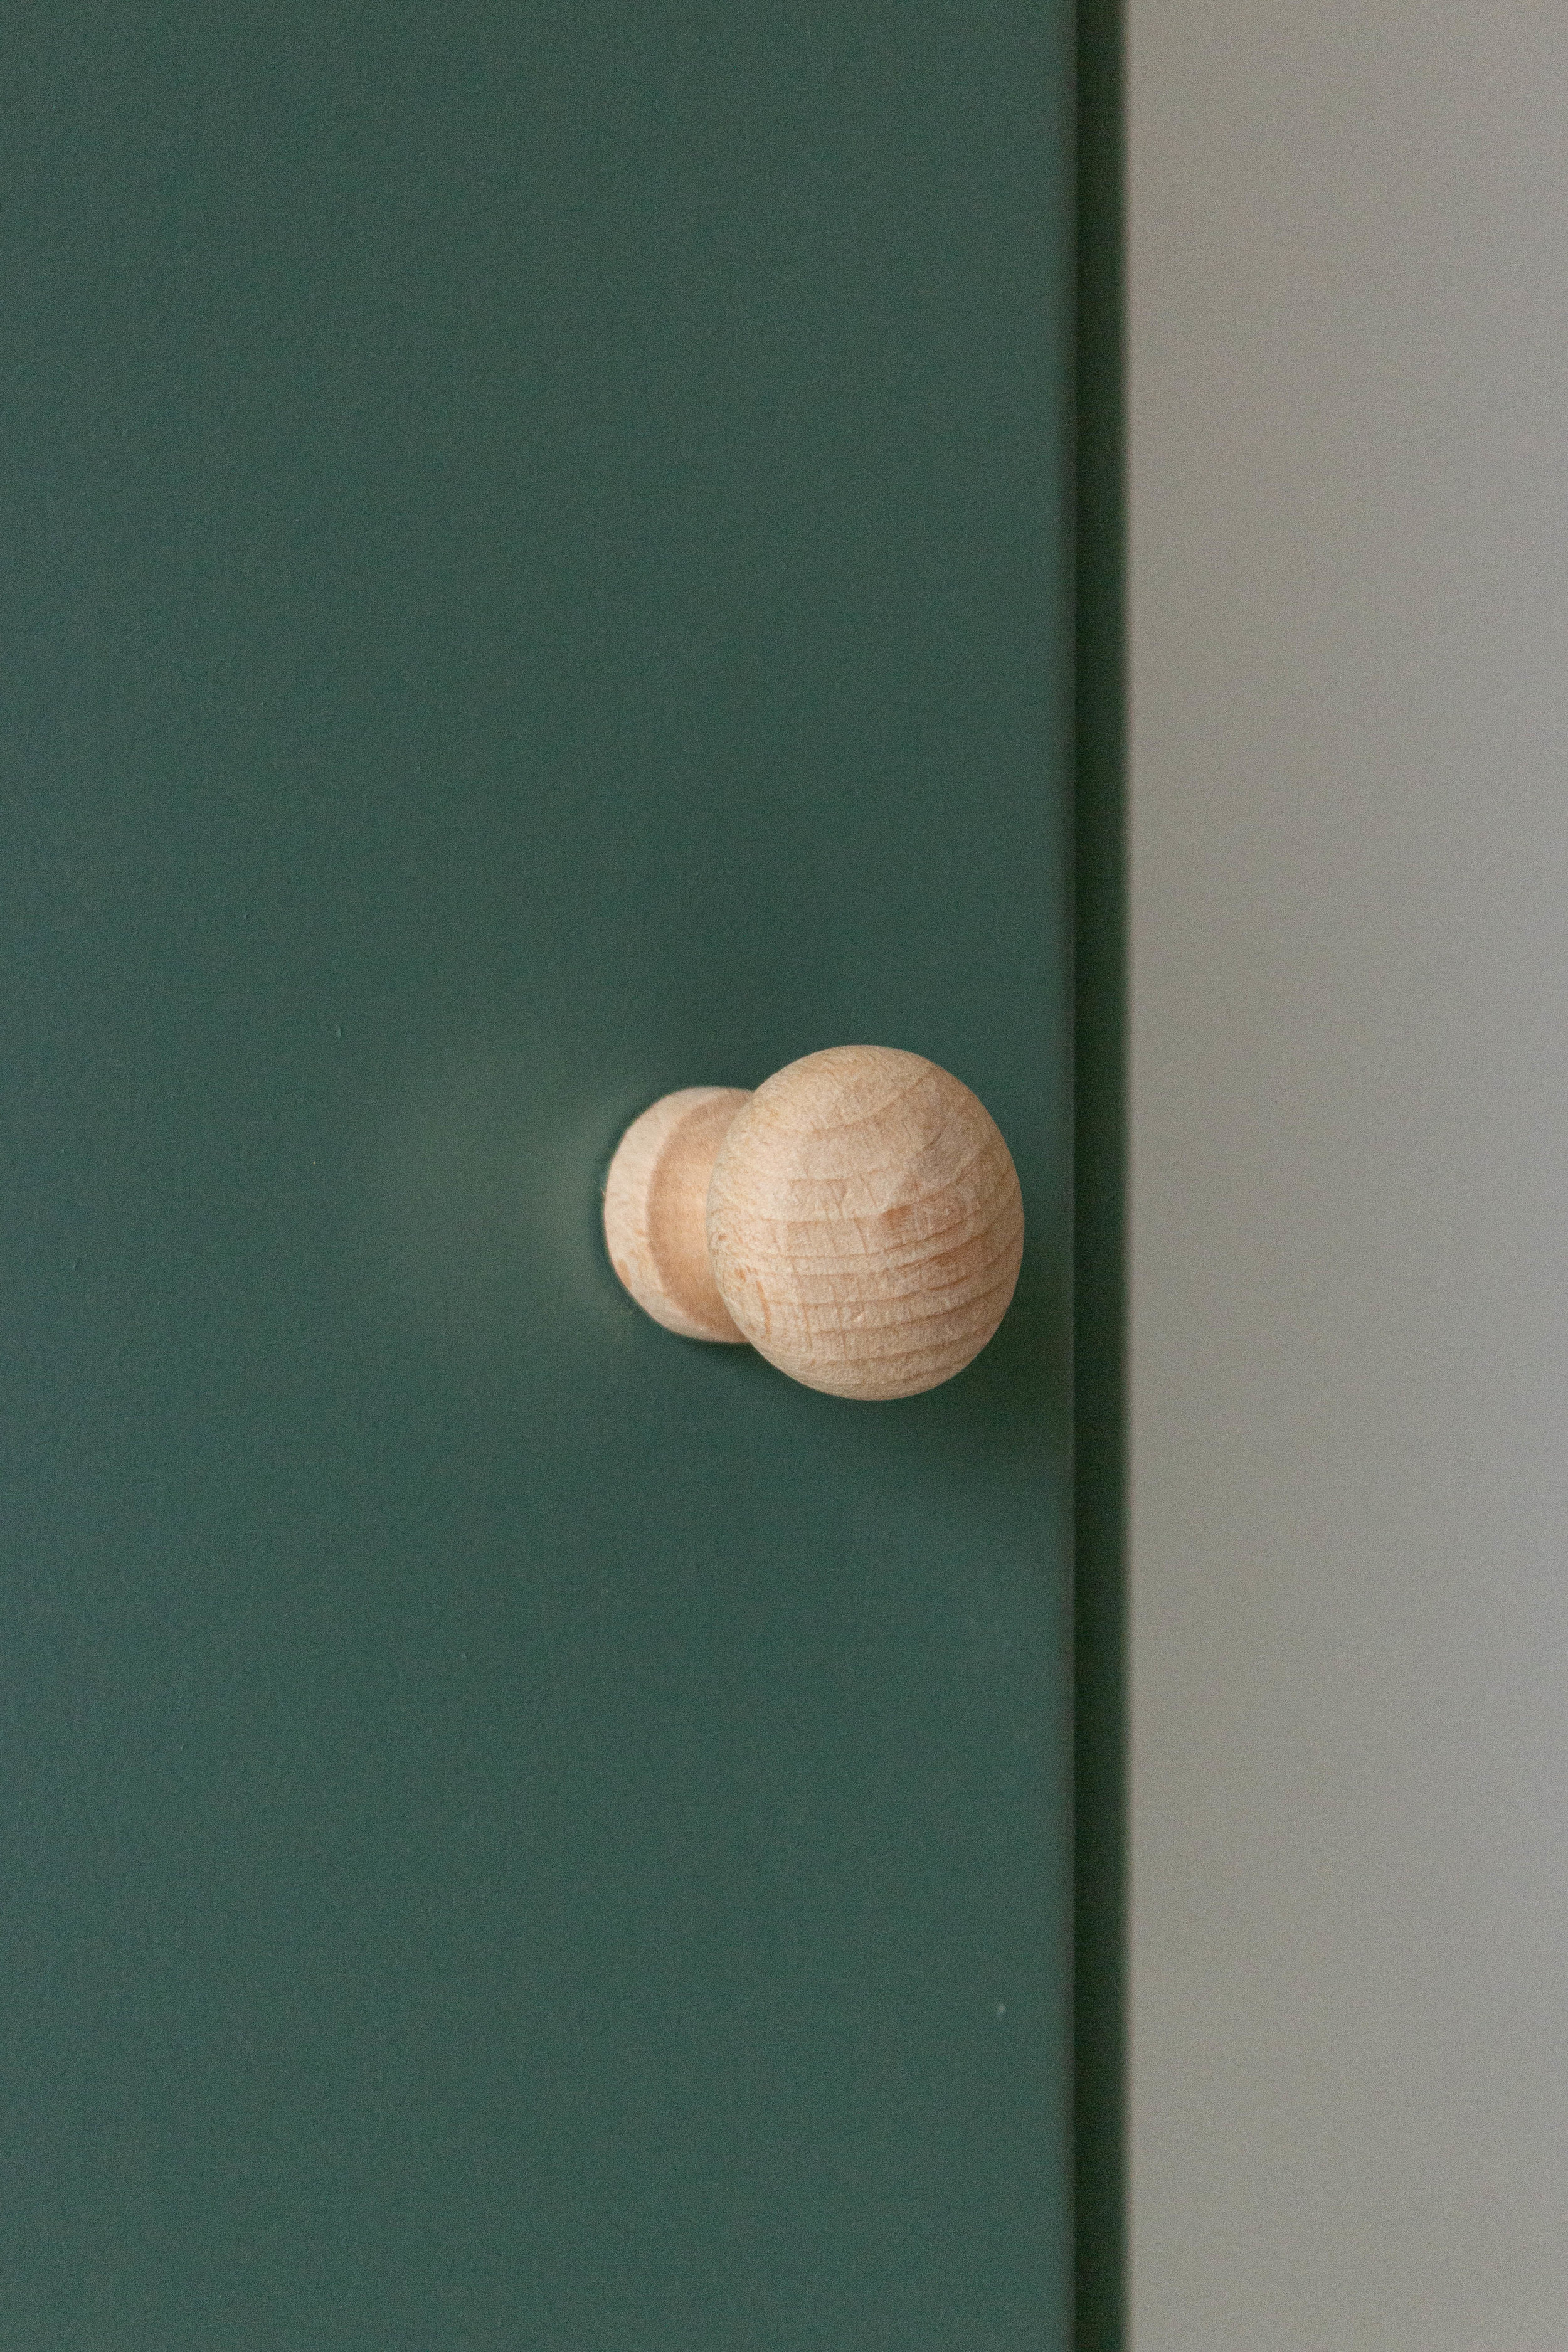 6035 - Dennengroen wadkastje met houten knop-2.jpg